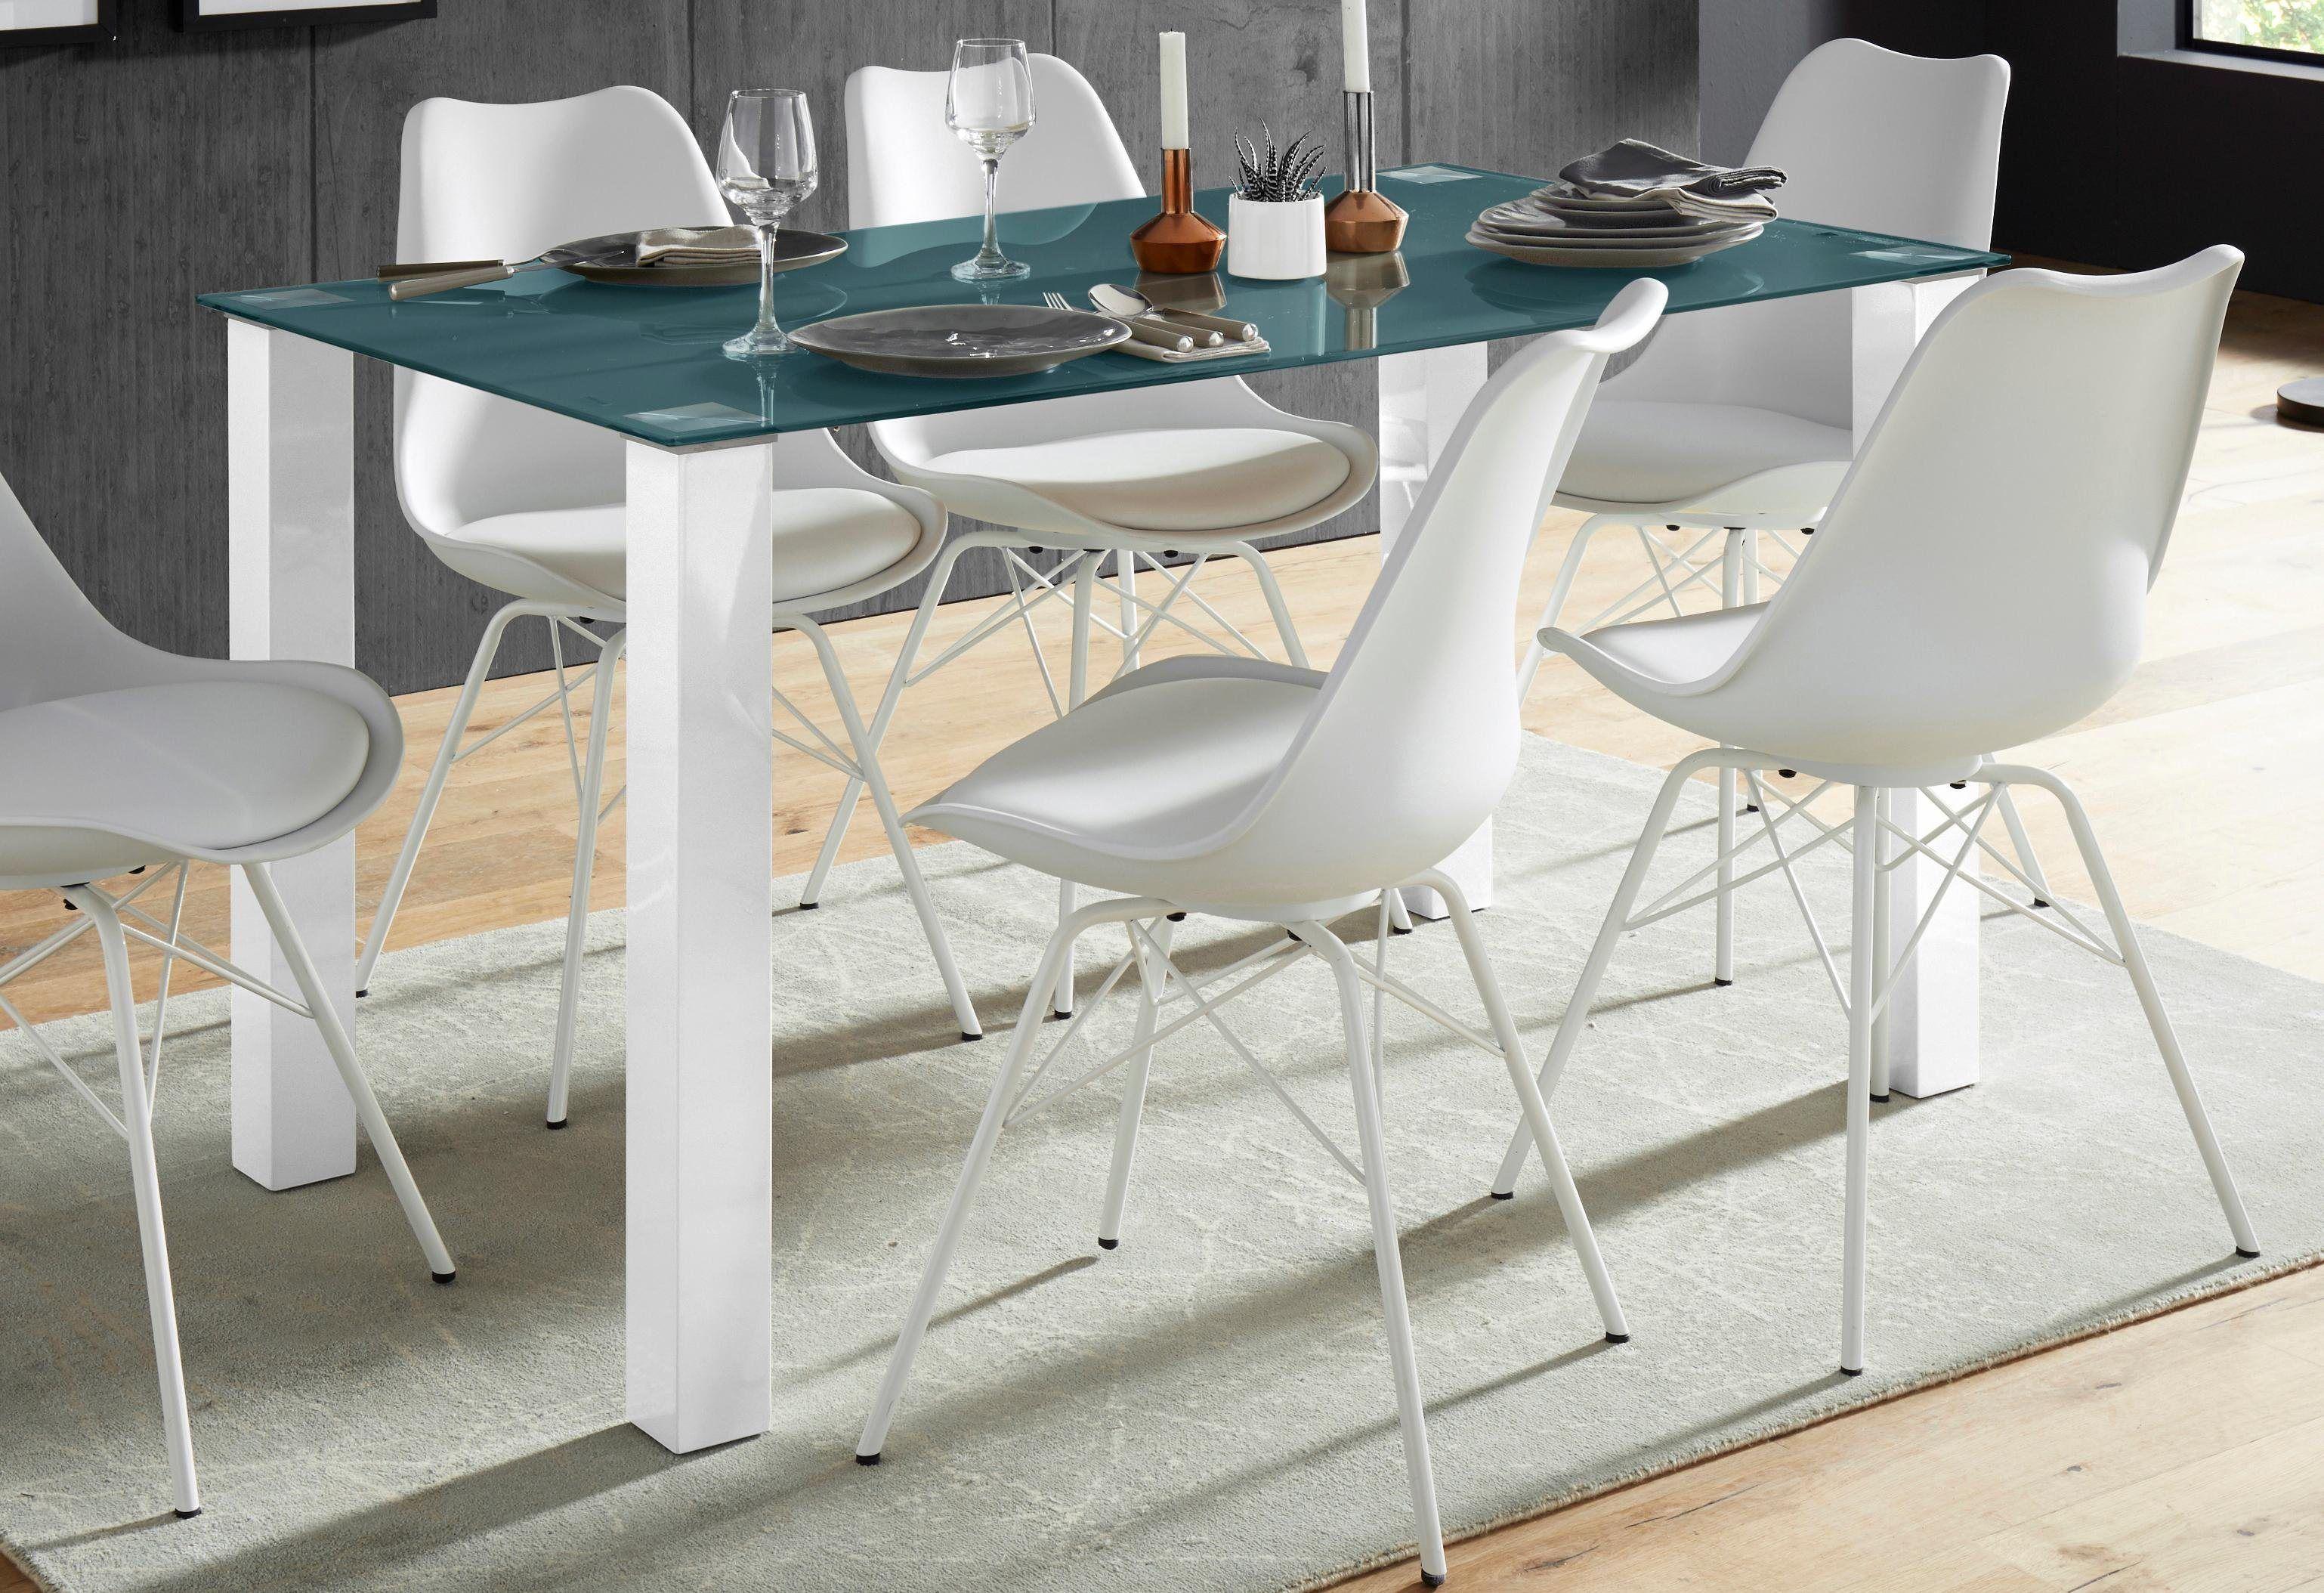 Esstisch In Verschiedenen Ausfuhrungen Jetzt Bestellen Unter Https Moebel Ladendirekt De Kueche Und Esszimmer Tische Esstische Kuche Tisch Esstisch Tisch